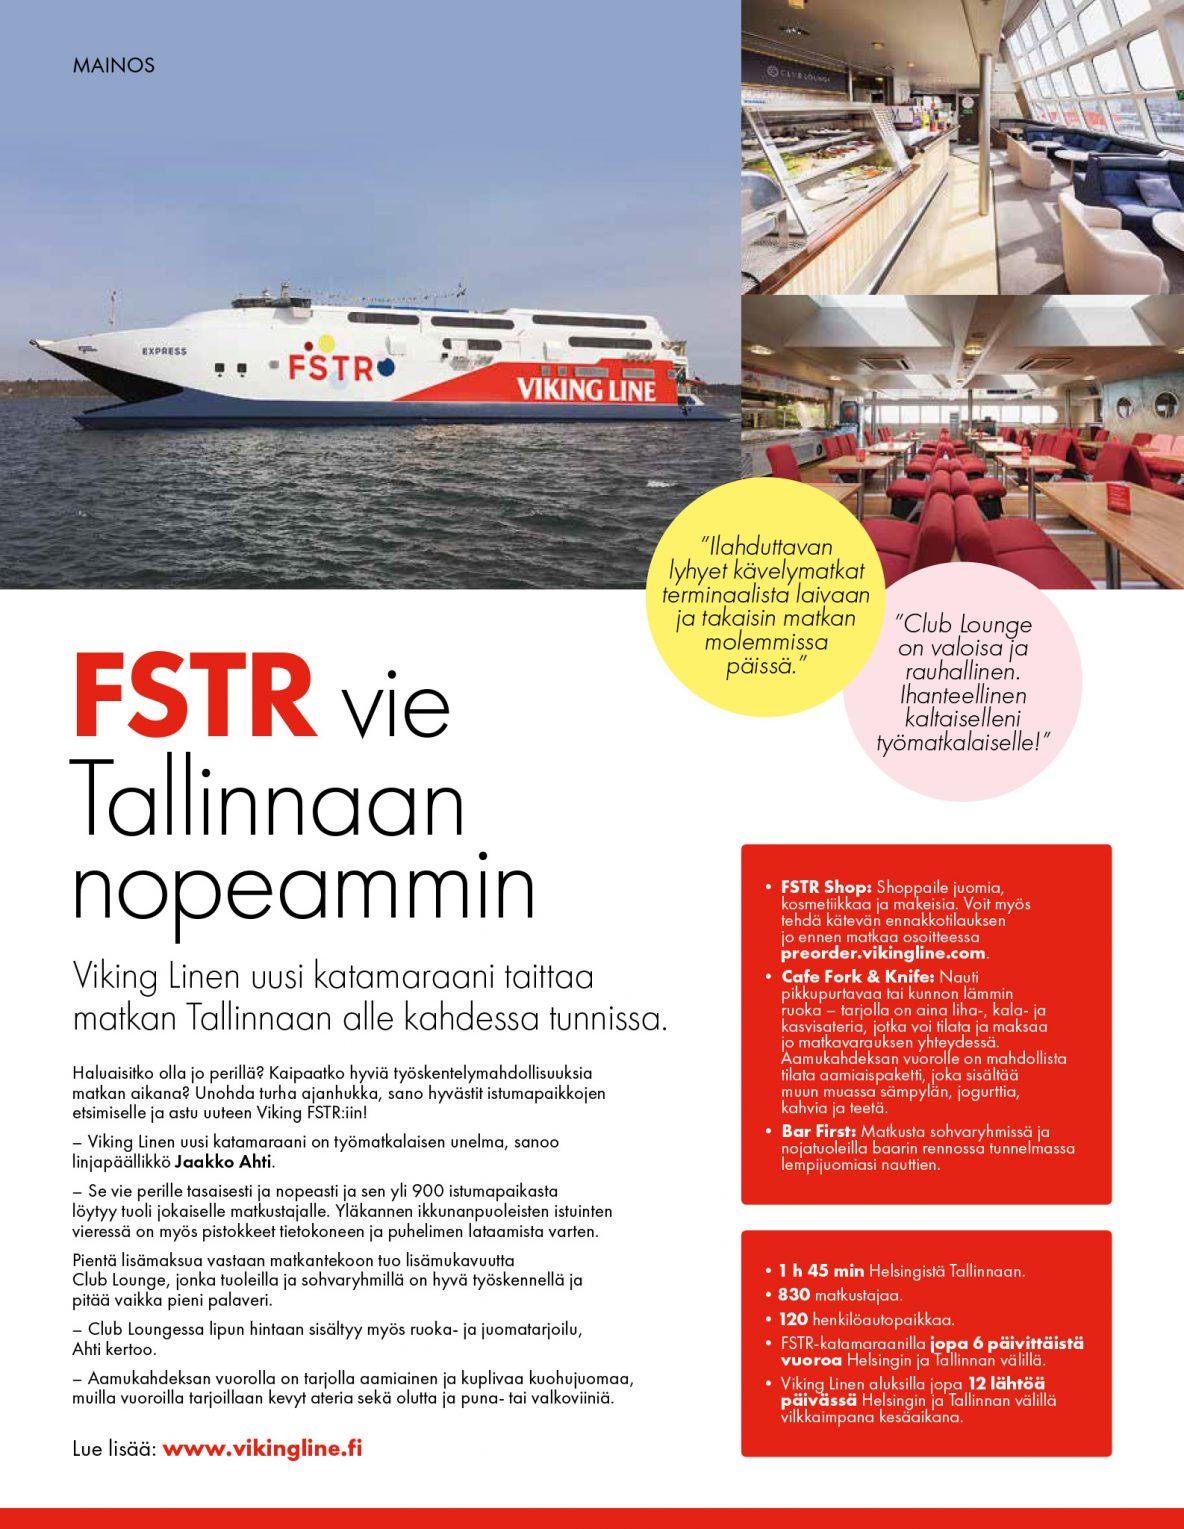 FSTR vie Tallinnaan nopeammin